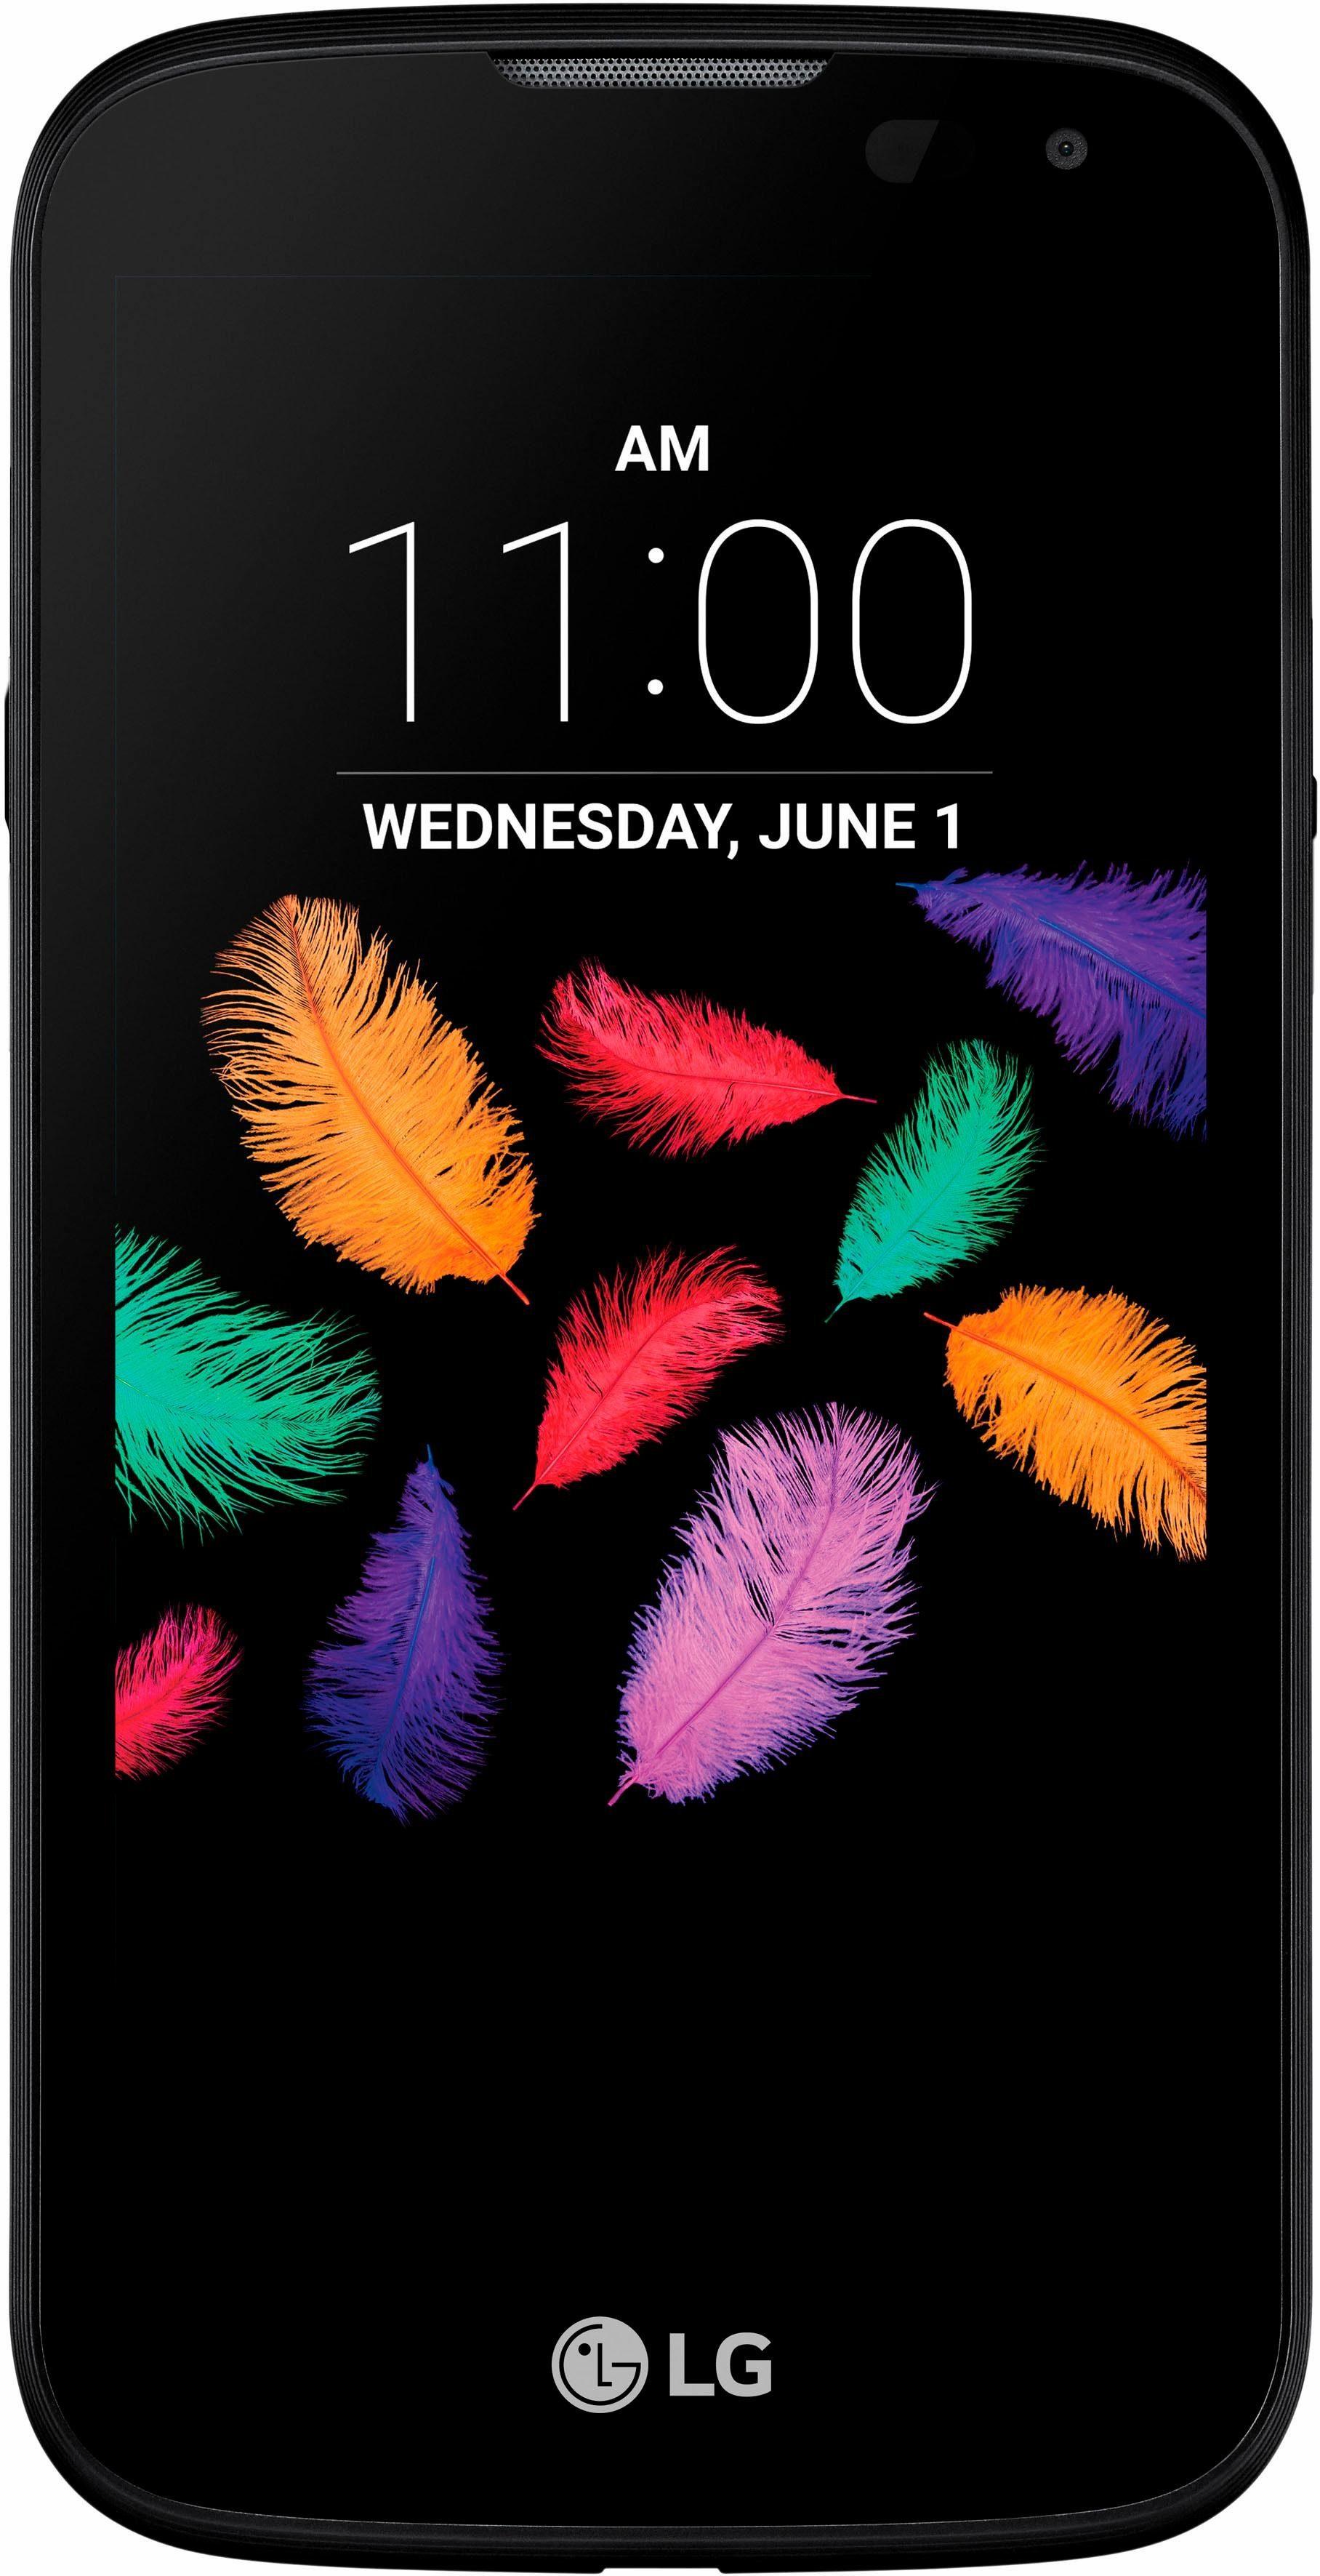 LG K3 - Dual SIM Smartphone, 11 cm (4,5 Zoll) Display, LTE (4G), 5,0 Megapixel, NFC